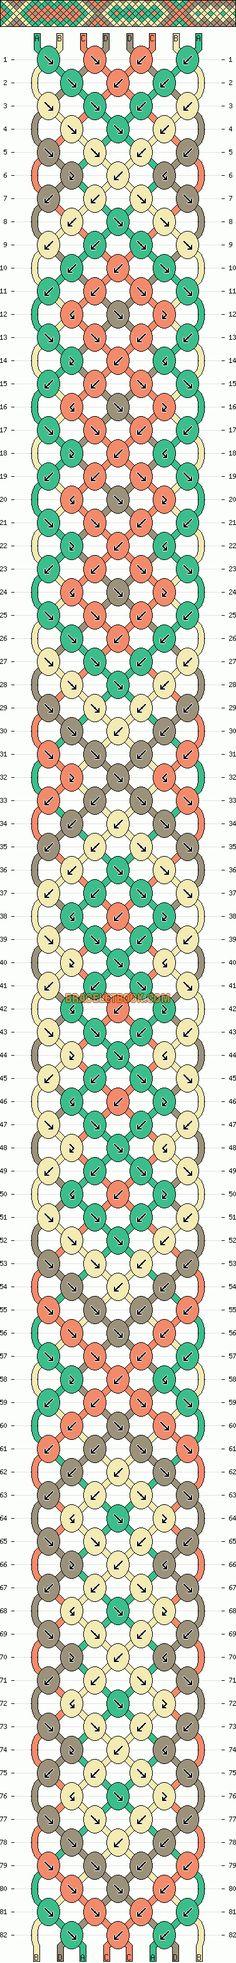 Normal Friendship Bracelet Pattern #10540 - BraceletBook.com